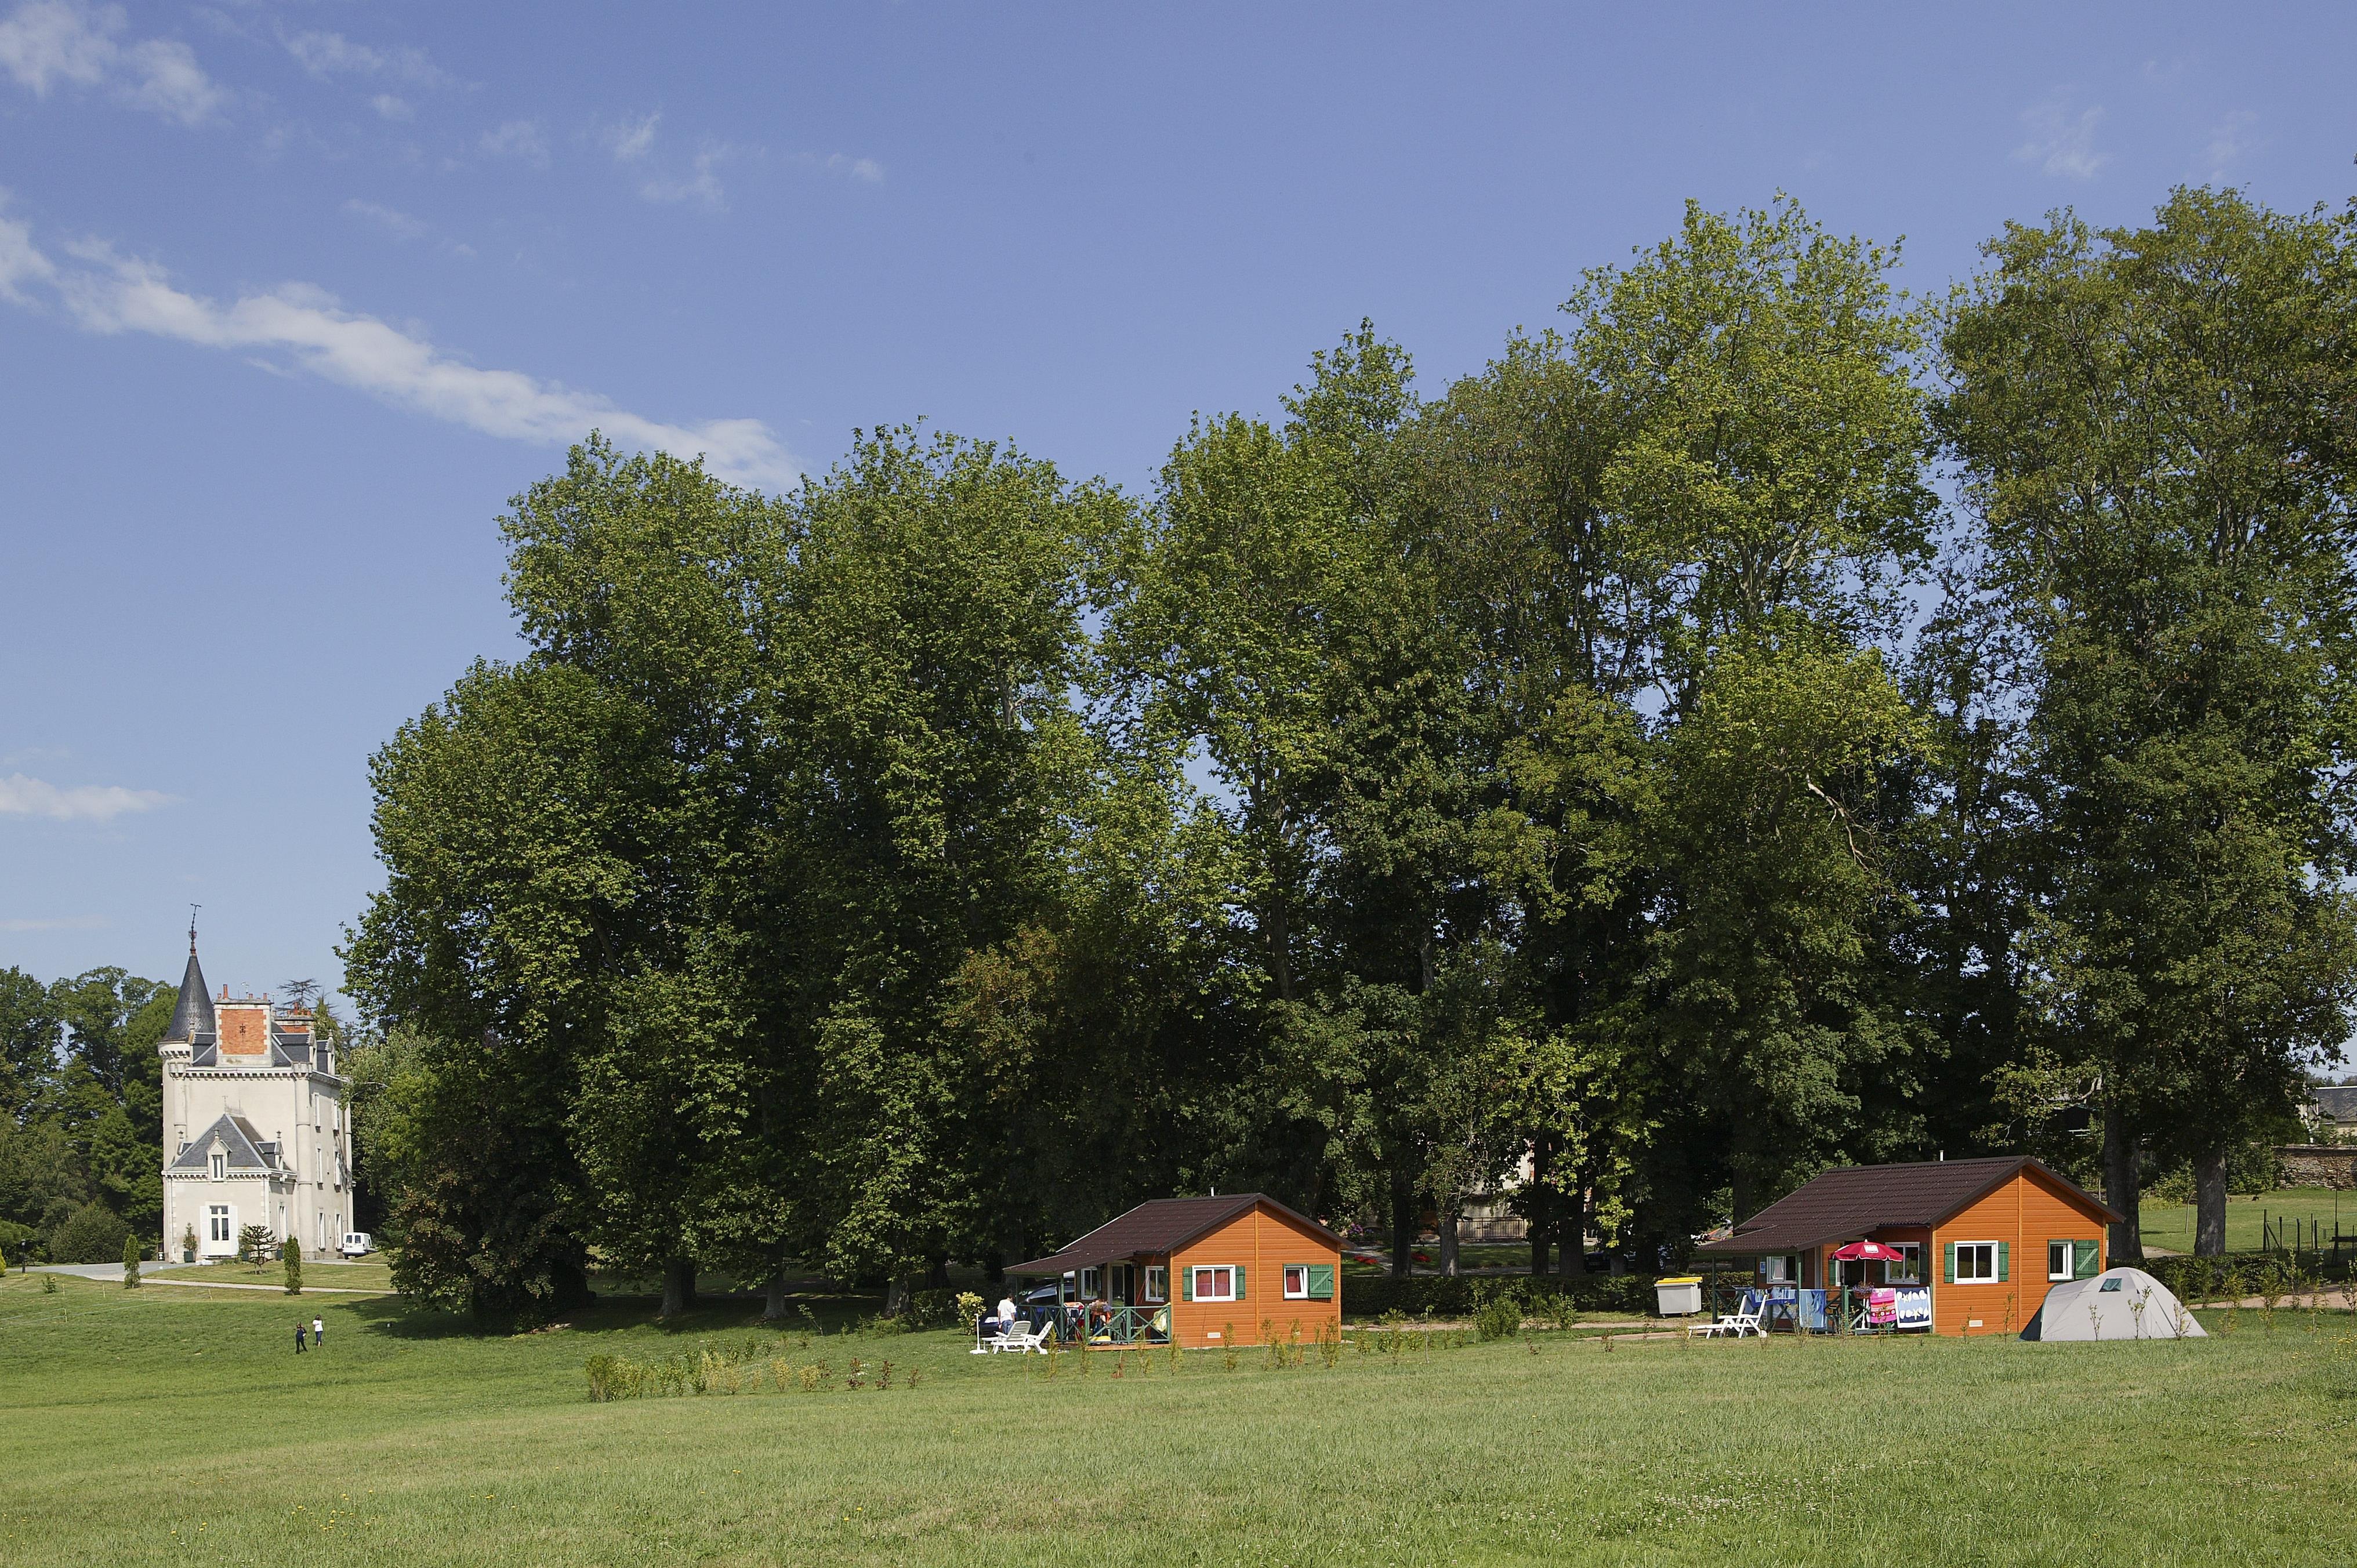 Camping Château de Poinsouze, Boussac, Creuse